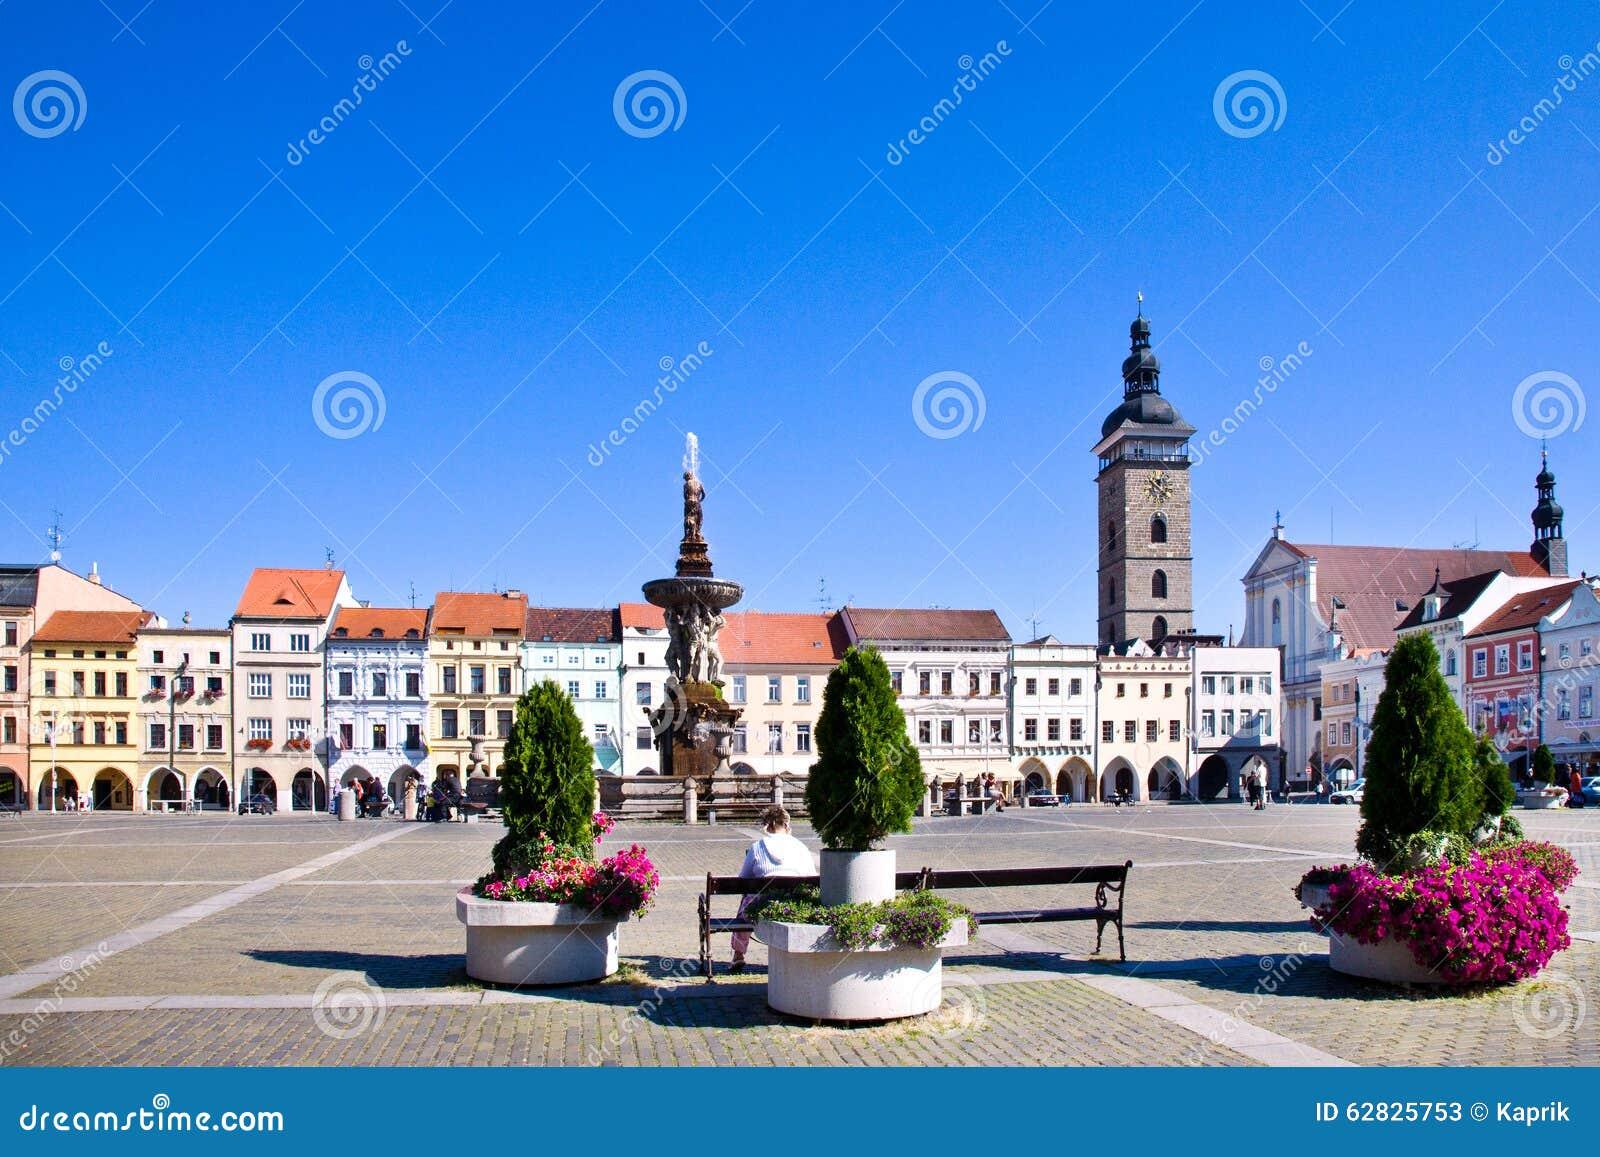 Ceske Budejovice Czech Republic  city photos gallery : CESKE BUDEJOVICE, CZECH REPUBLIC JULY 15 Premysl Otakar square and ...